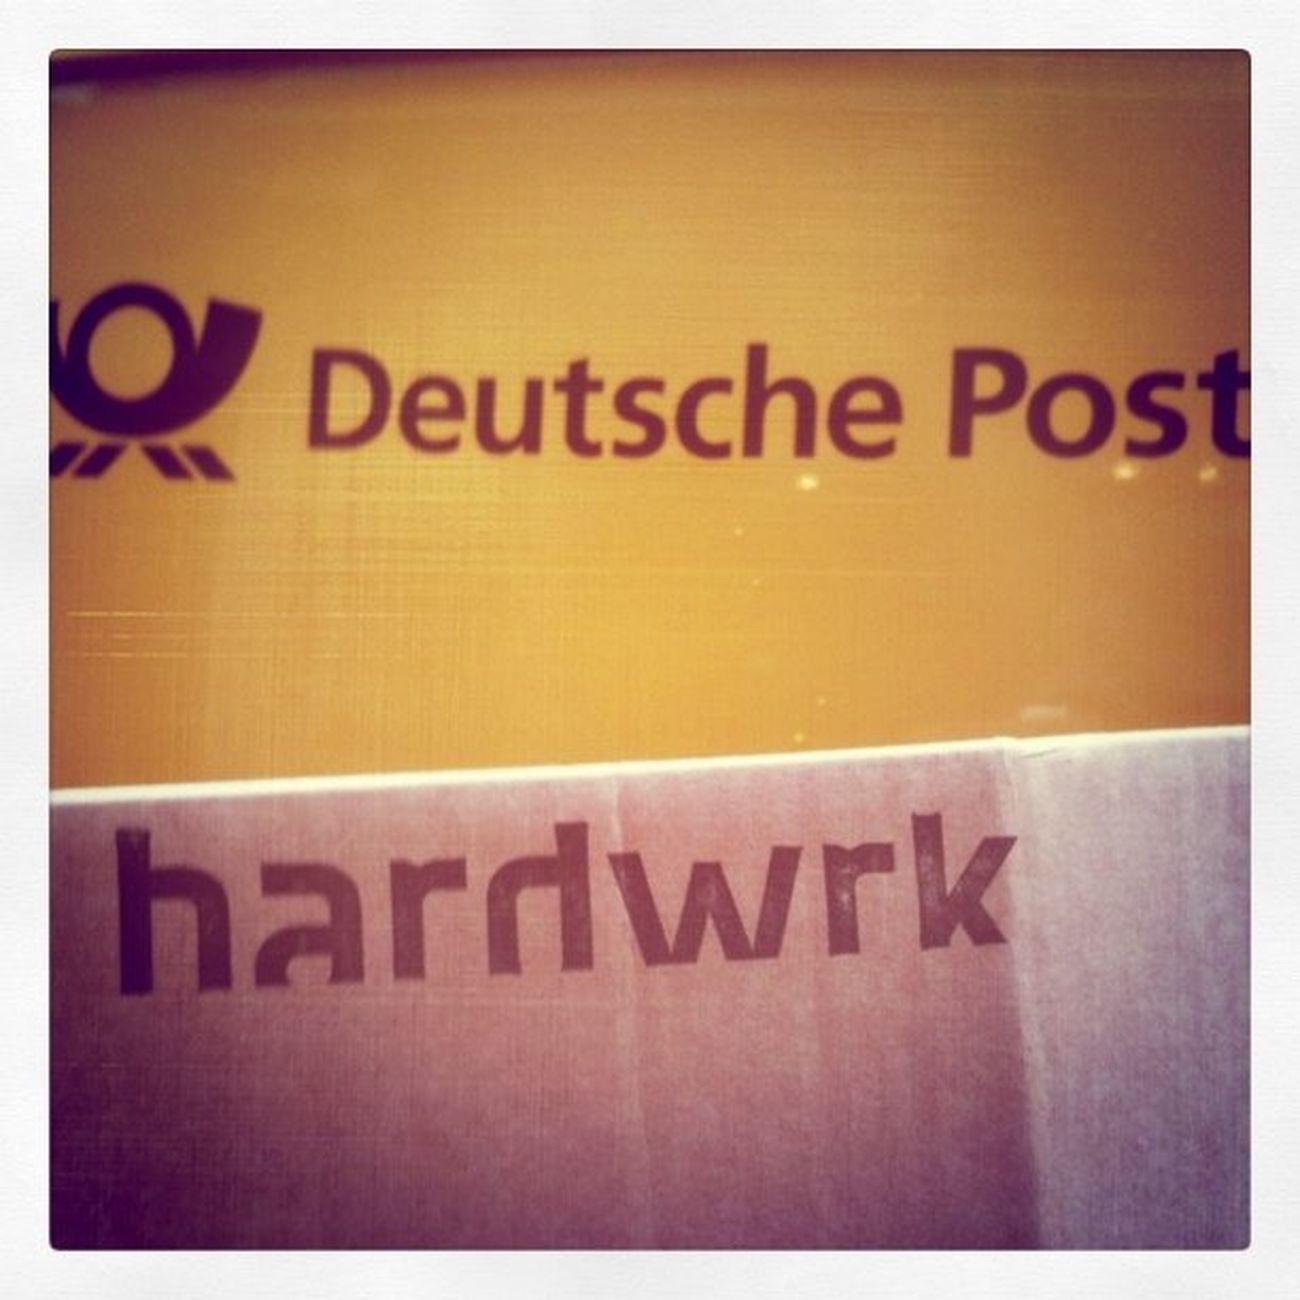 die post war da #hardwrk #ssd #t3n SSD T3n Hardwrk